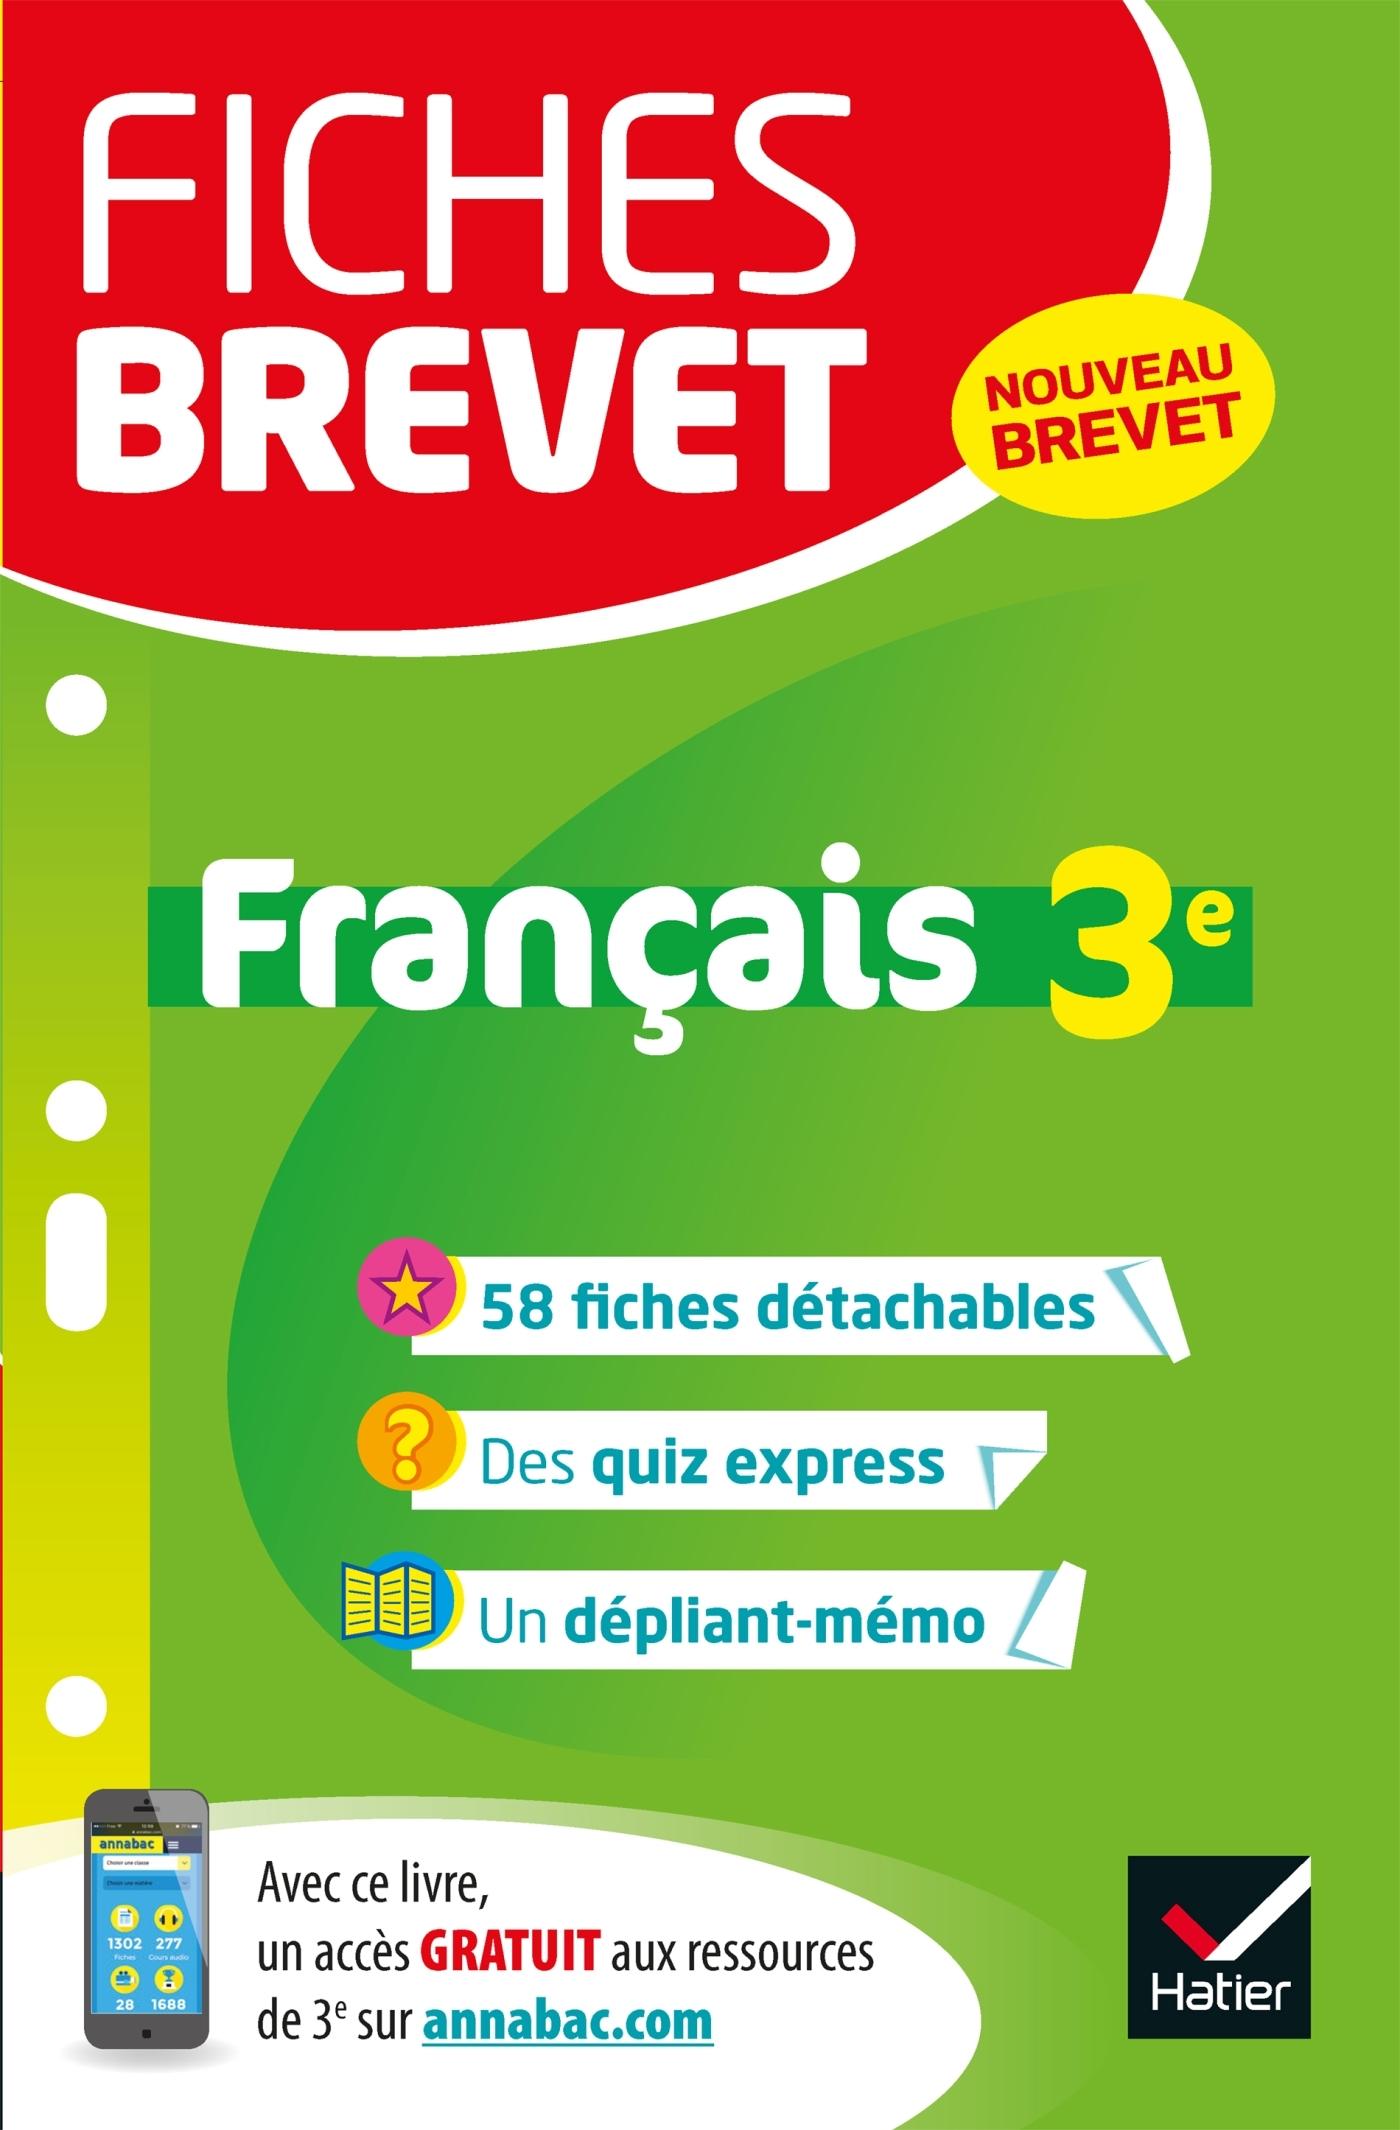 FICHES BREVET FRANCAIS 3E